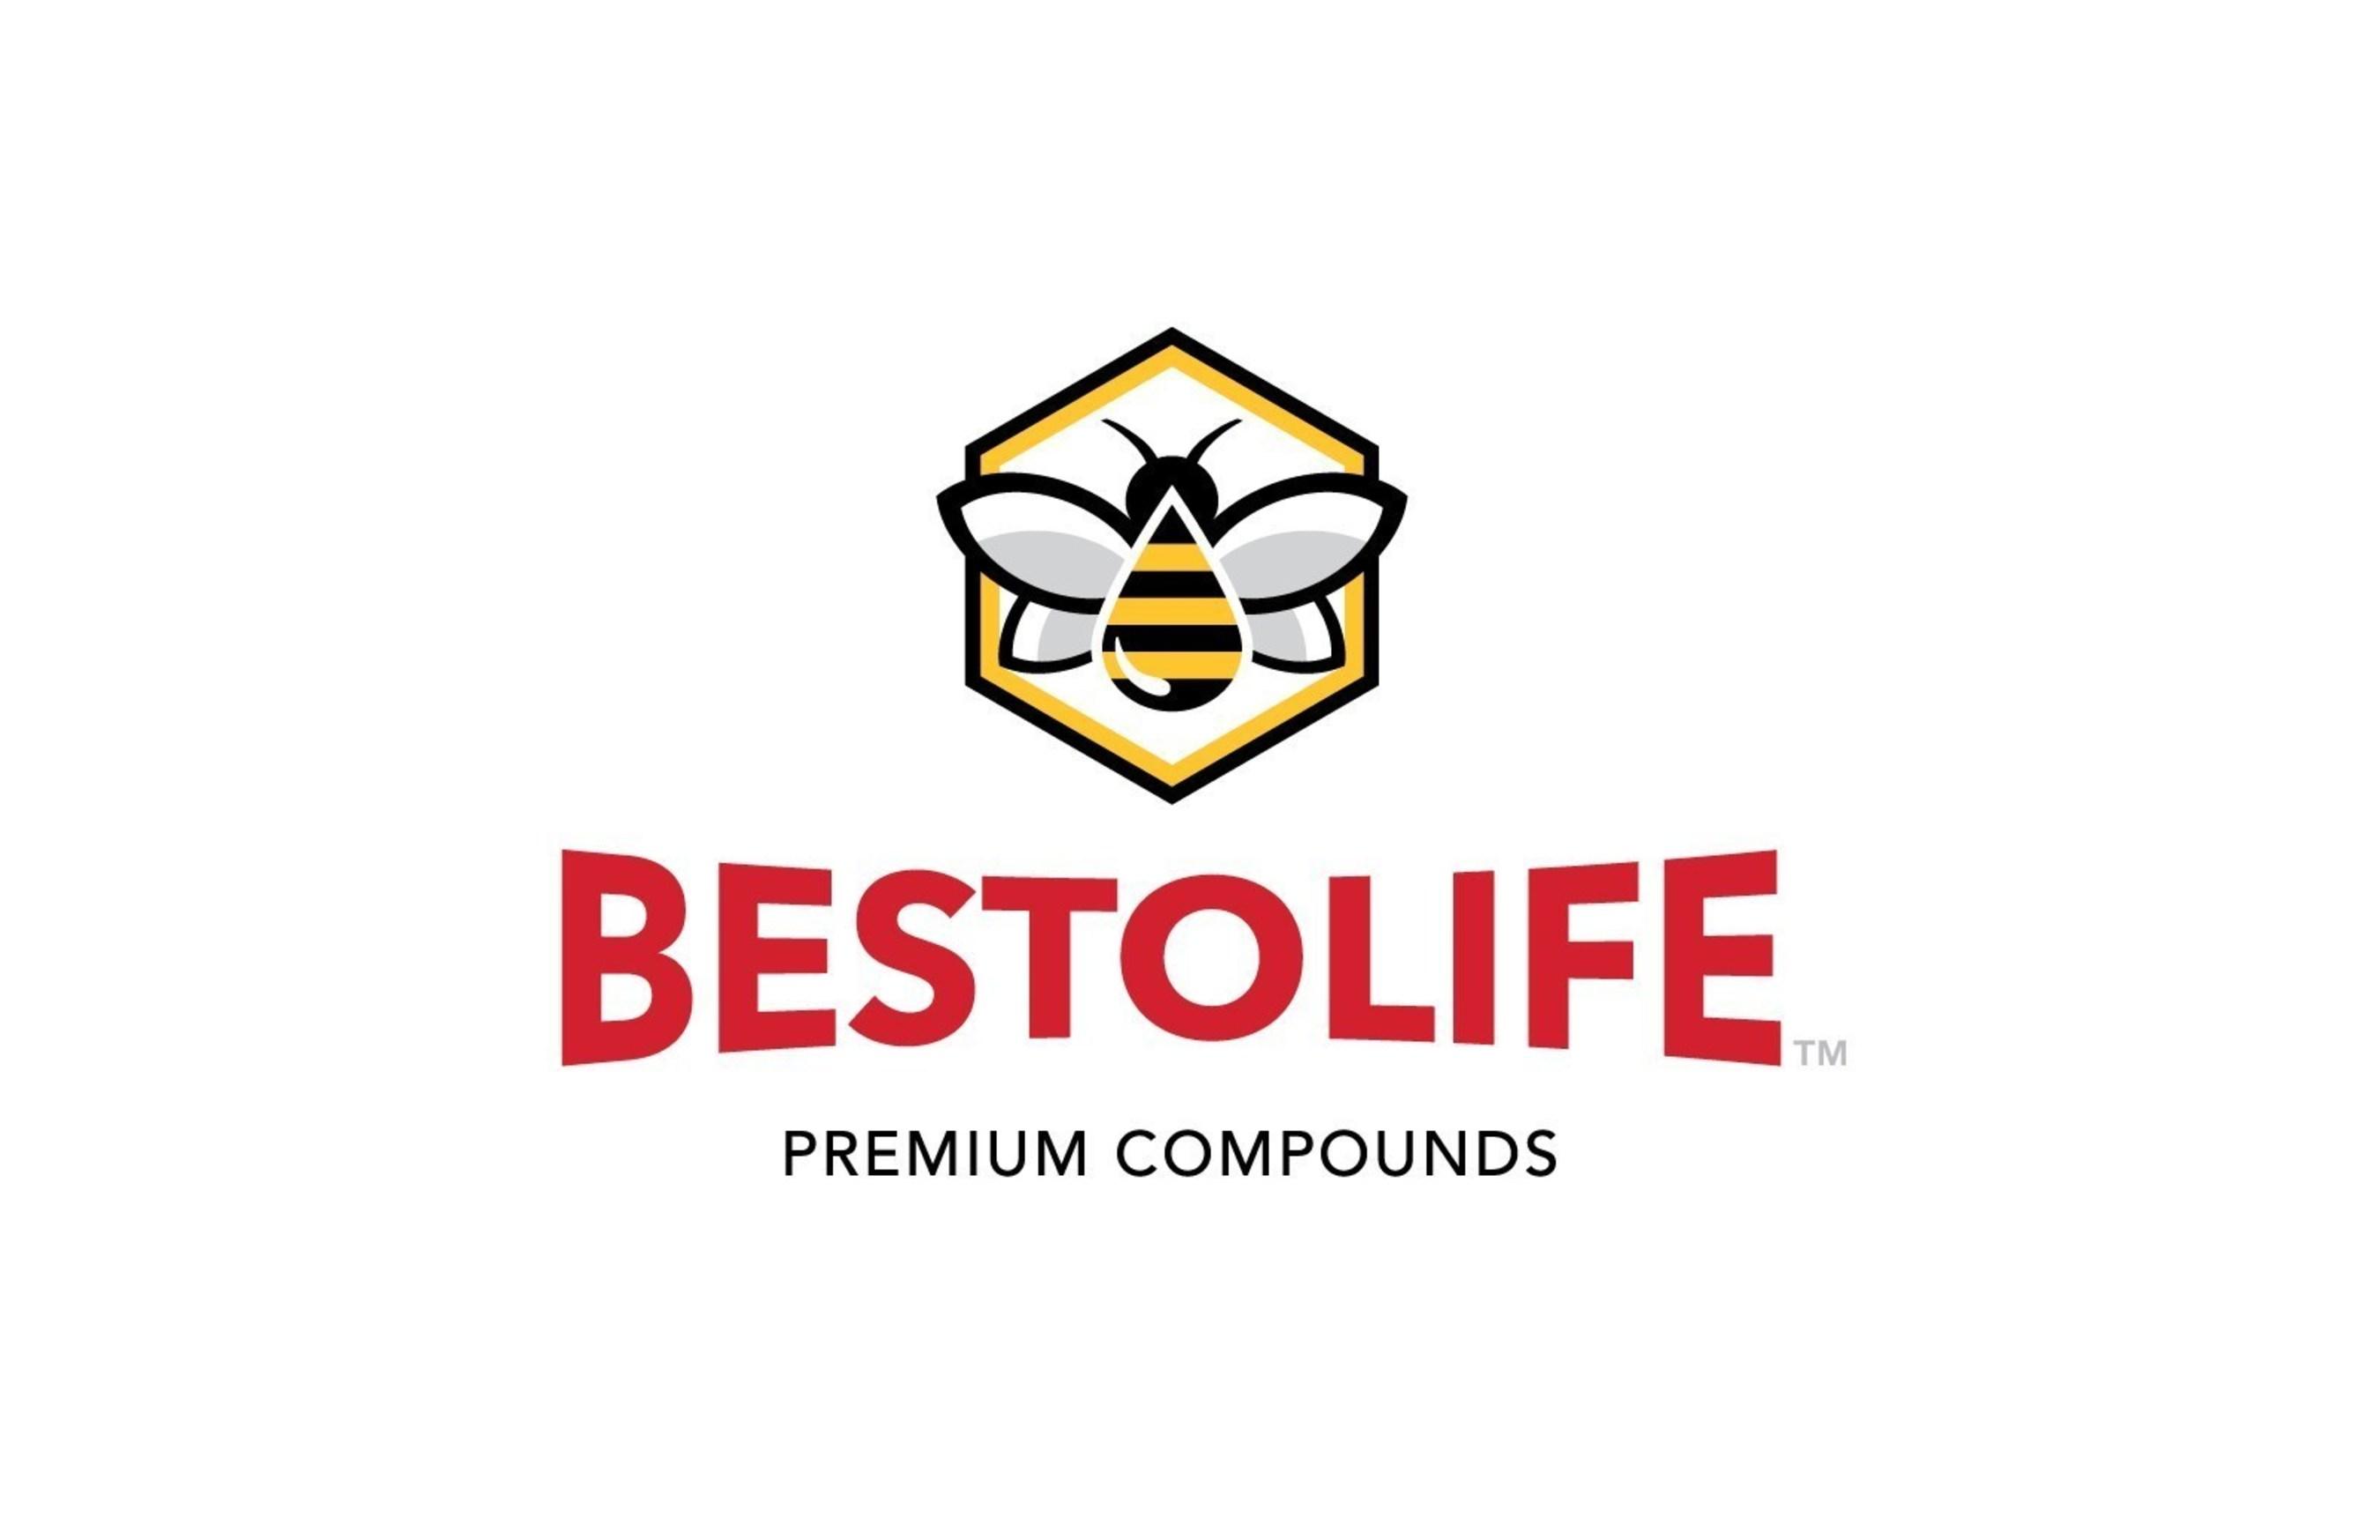 BESTOLIFE Corporation